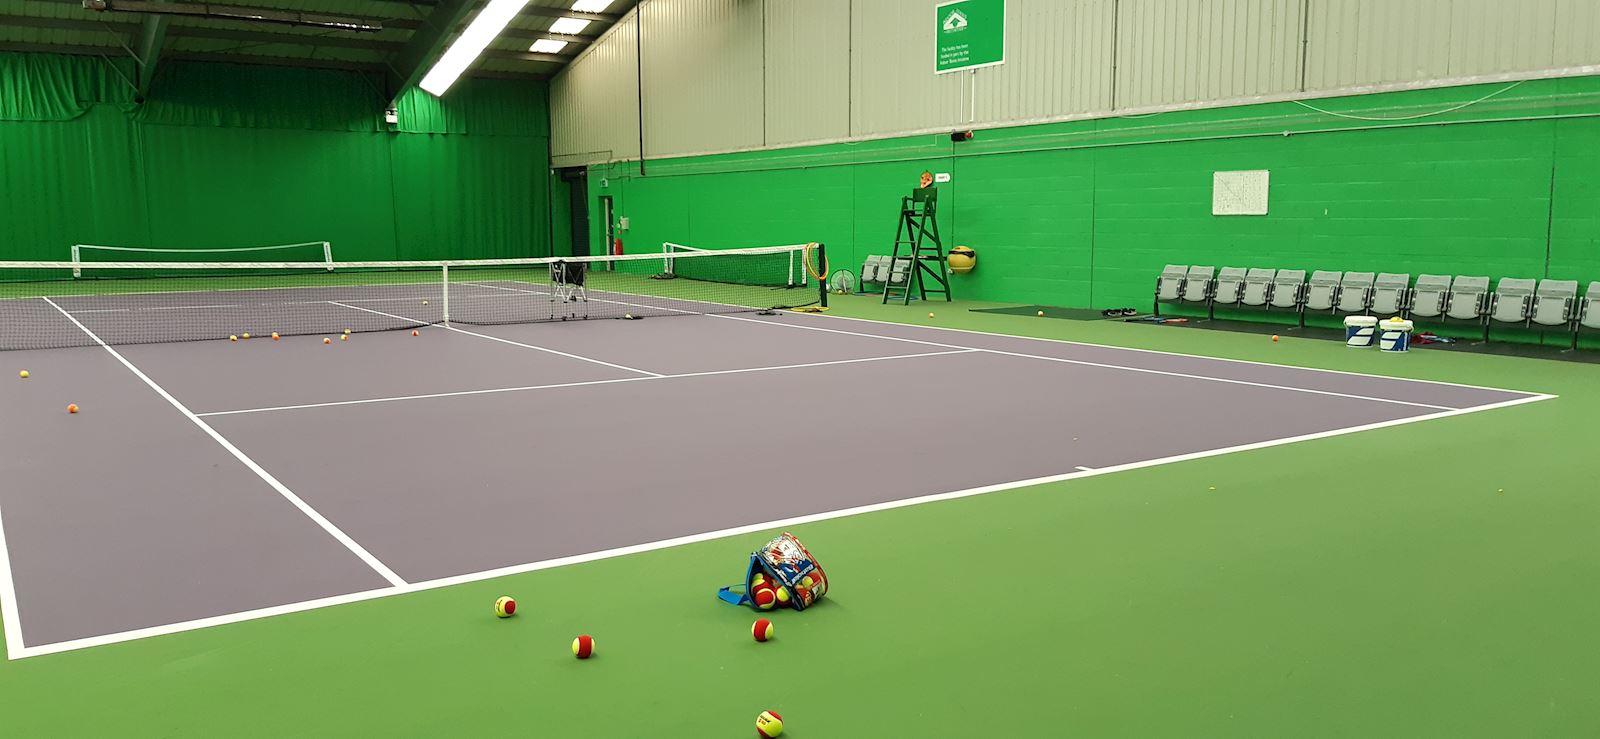 Batley Sport and Tennis Centre